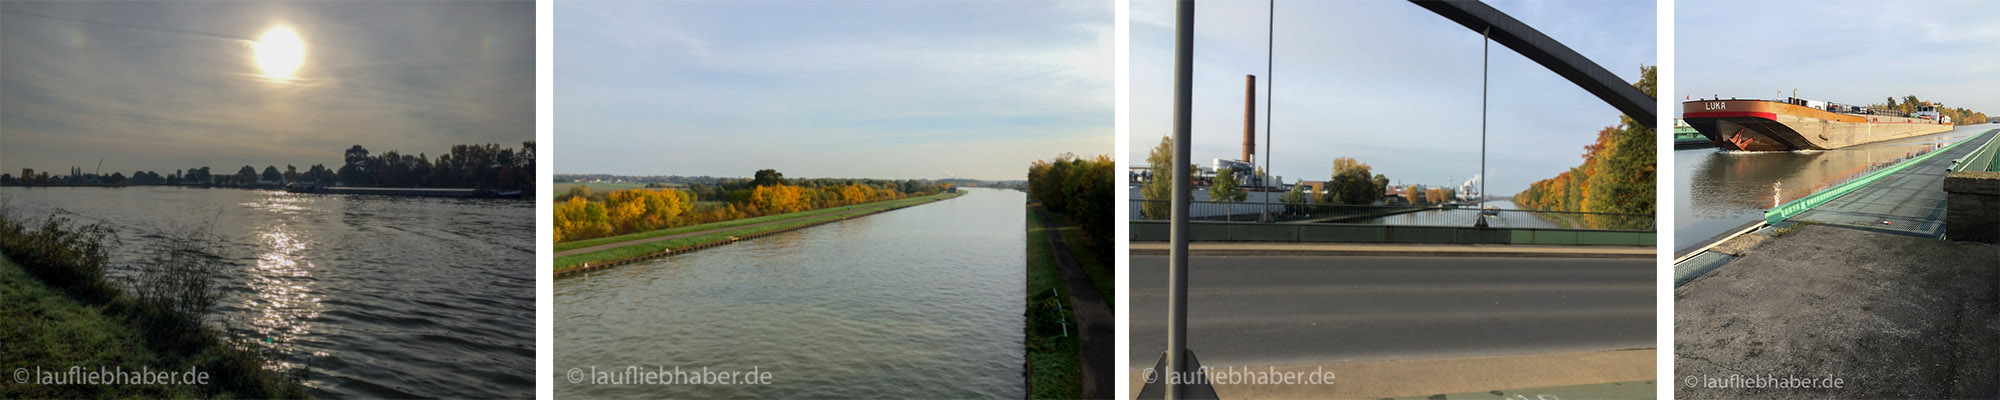 Bilderreihe Mittellandkanal